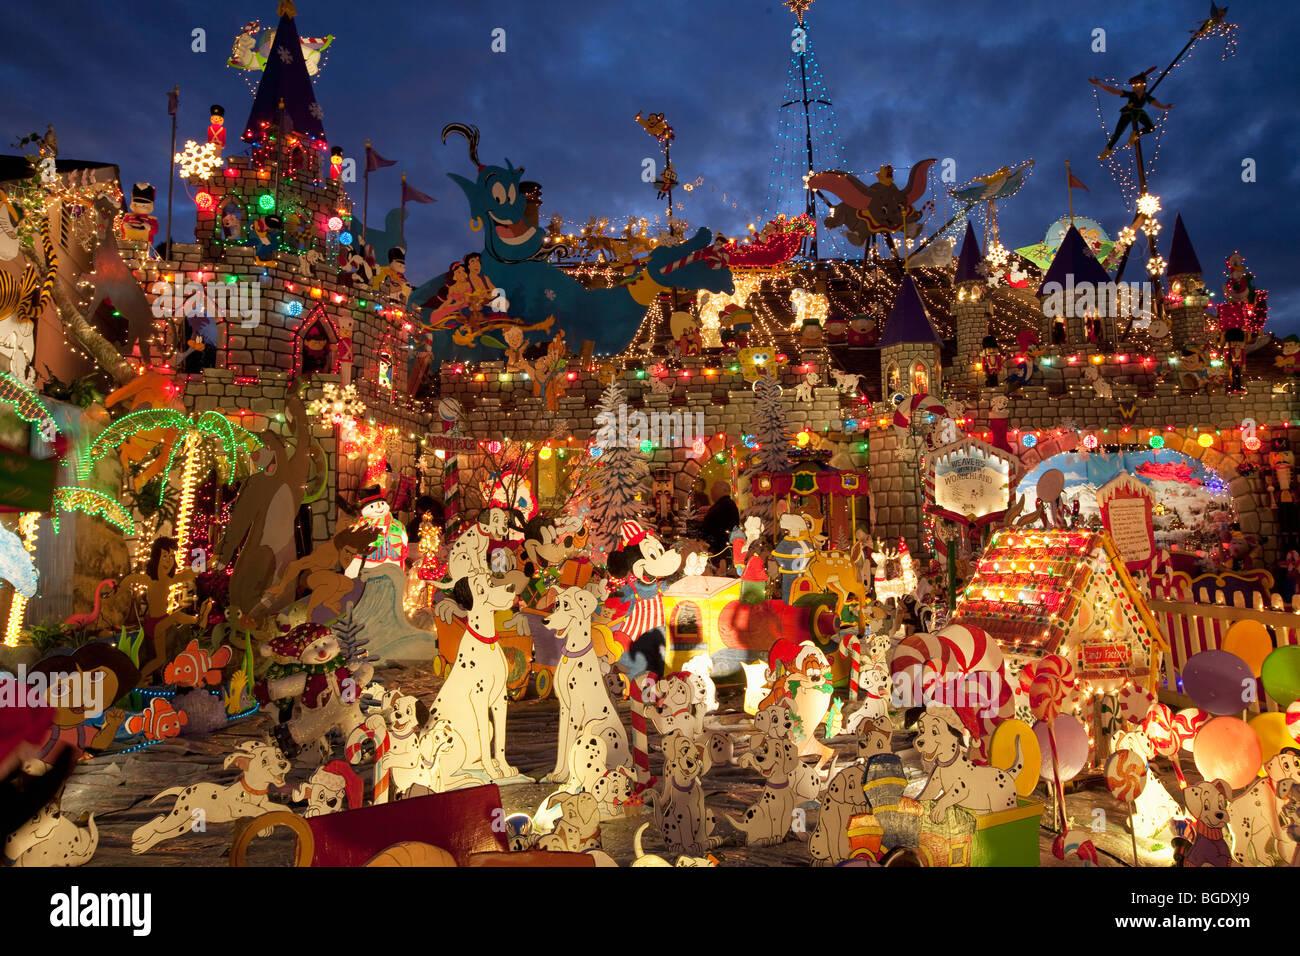 Christmas Yard Decorations.Christmas Yard Decorations Stock Photos Christmas Yard